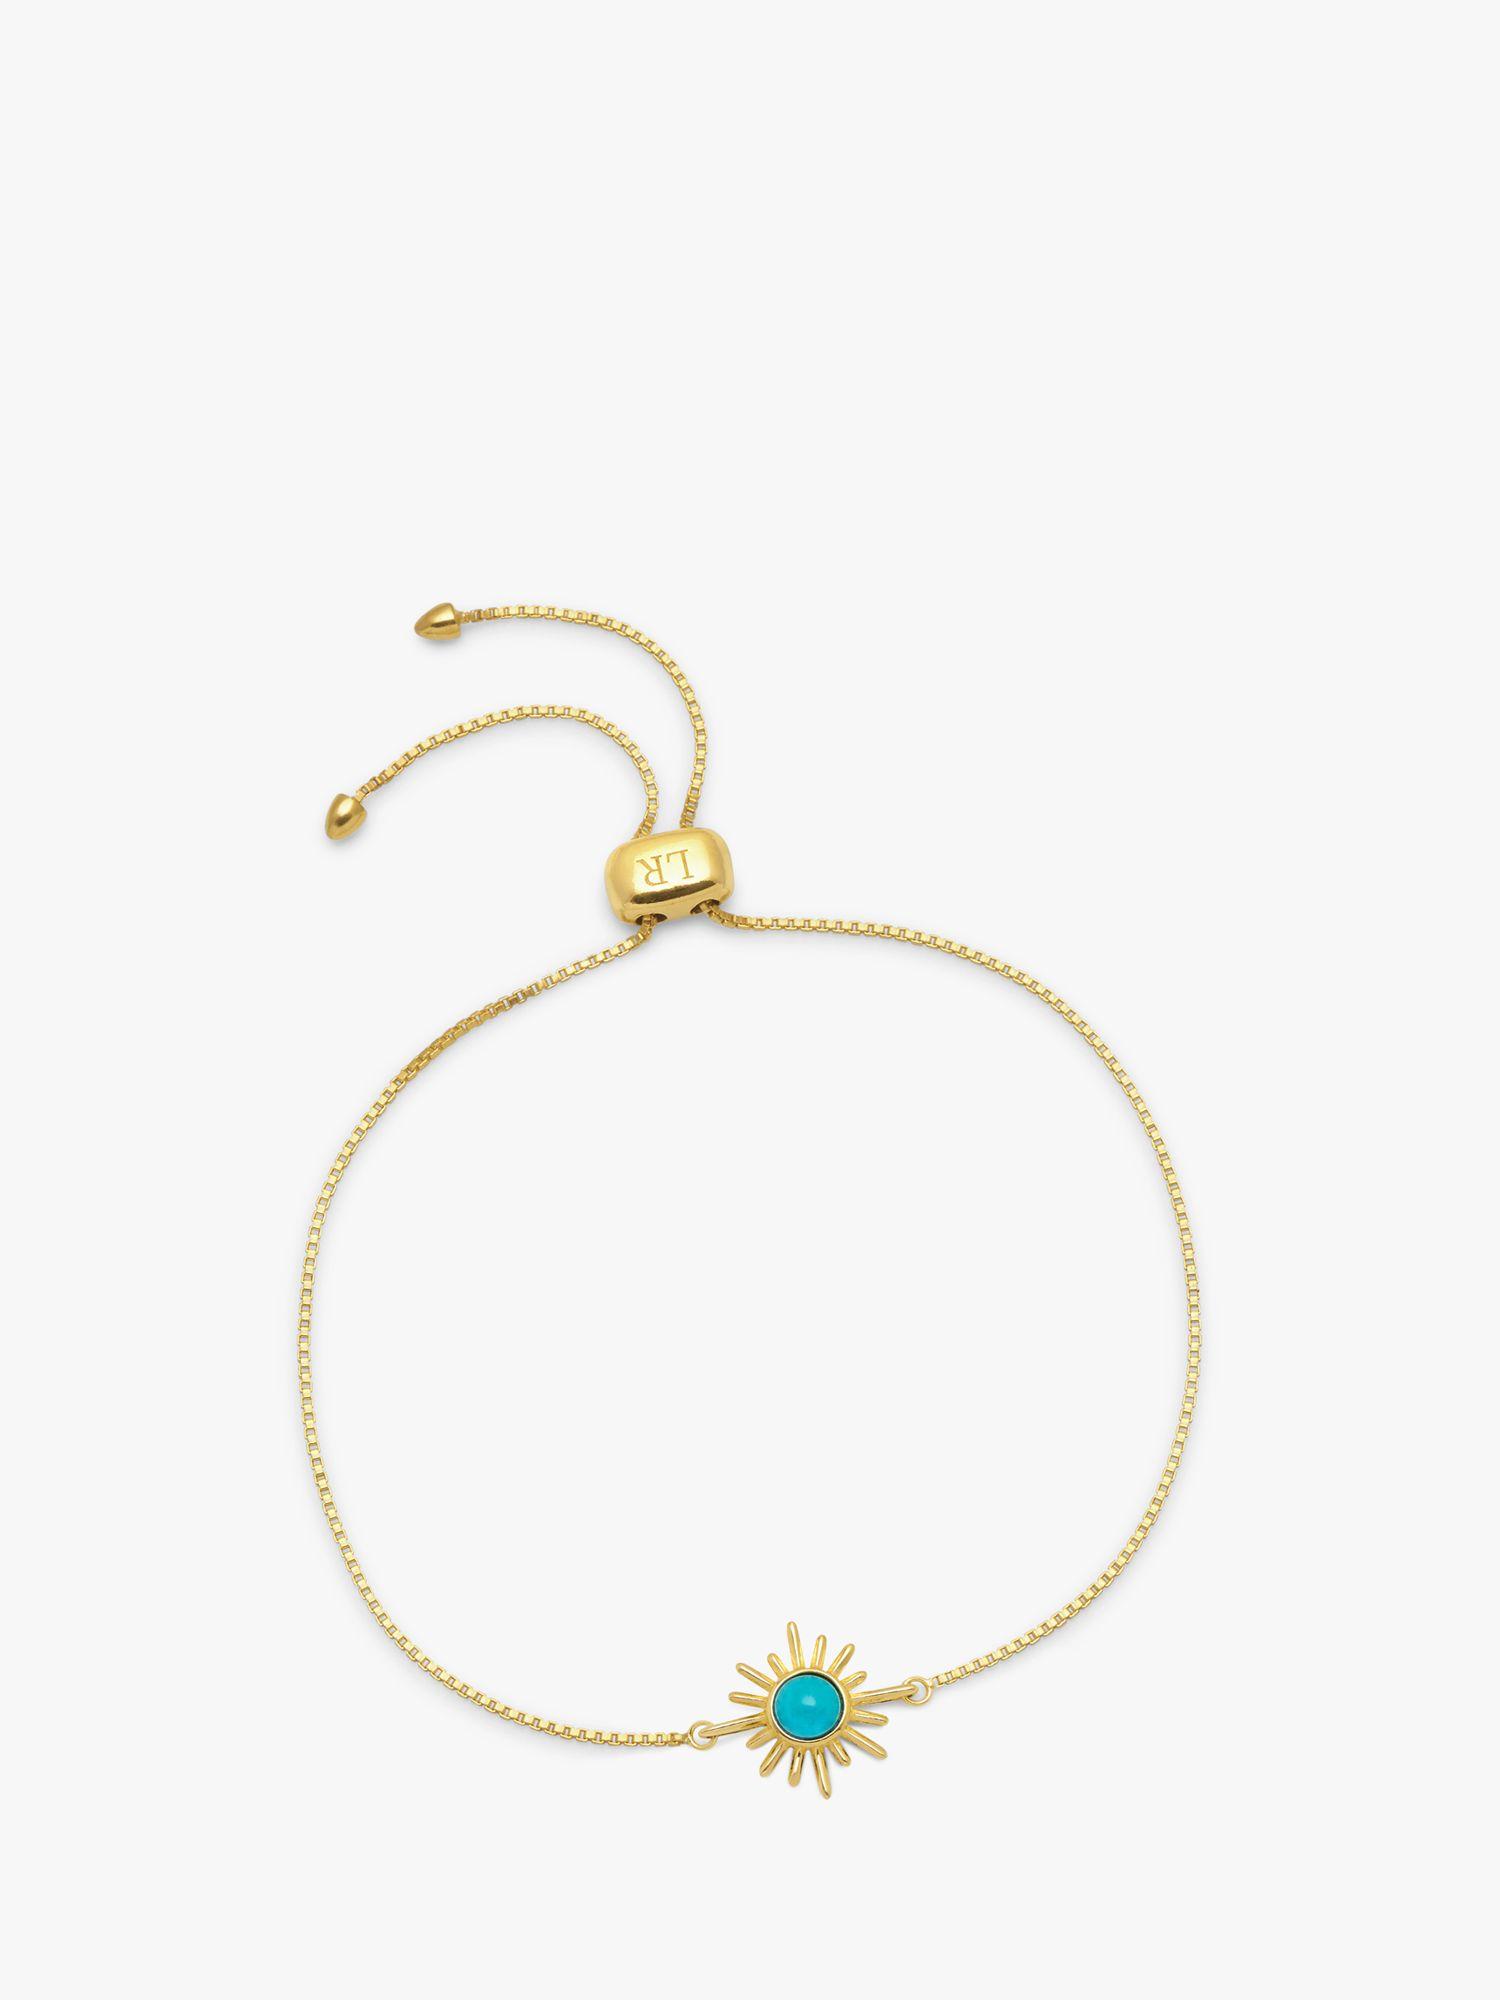 Lola Rose Lola Rose Curio Celestial Sunburst Slider Chain Bracelet, Faux Turquoise